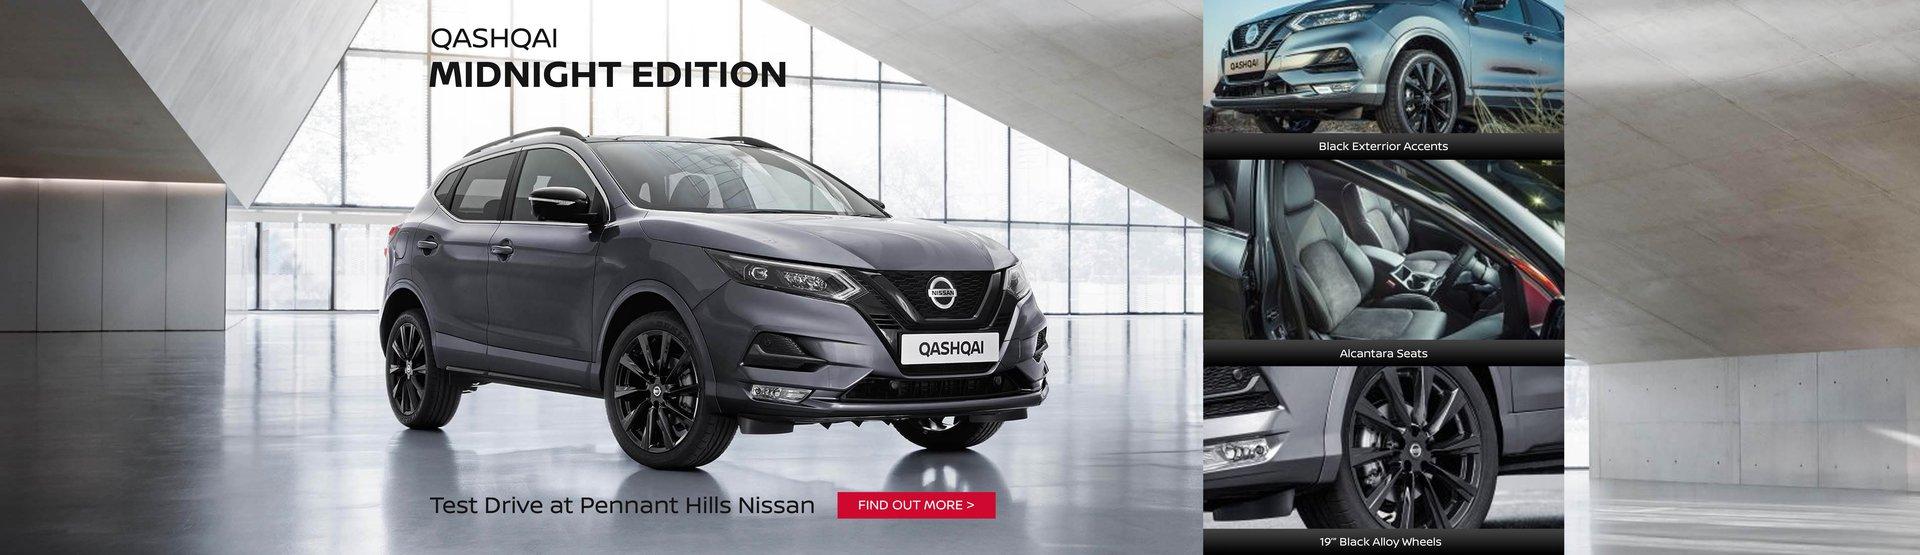 Pennant Hills Nissan | Qashqai